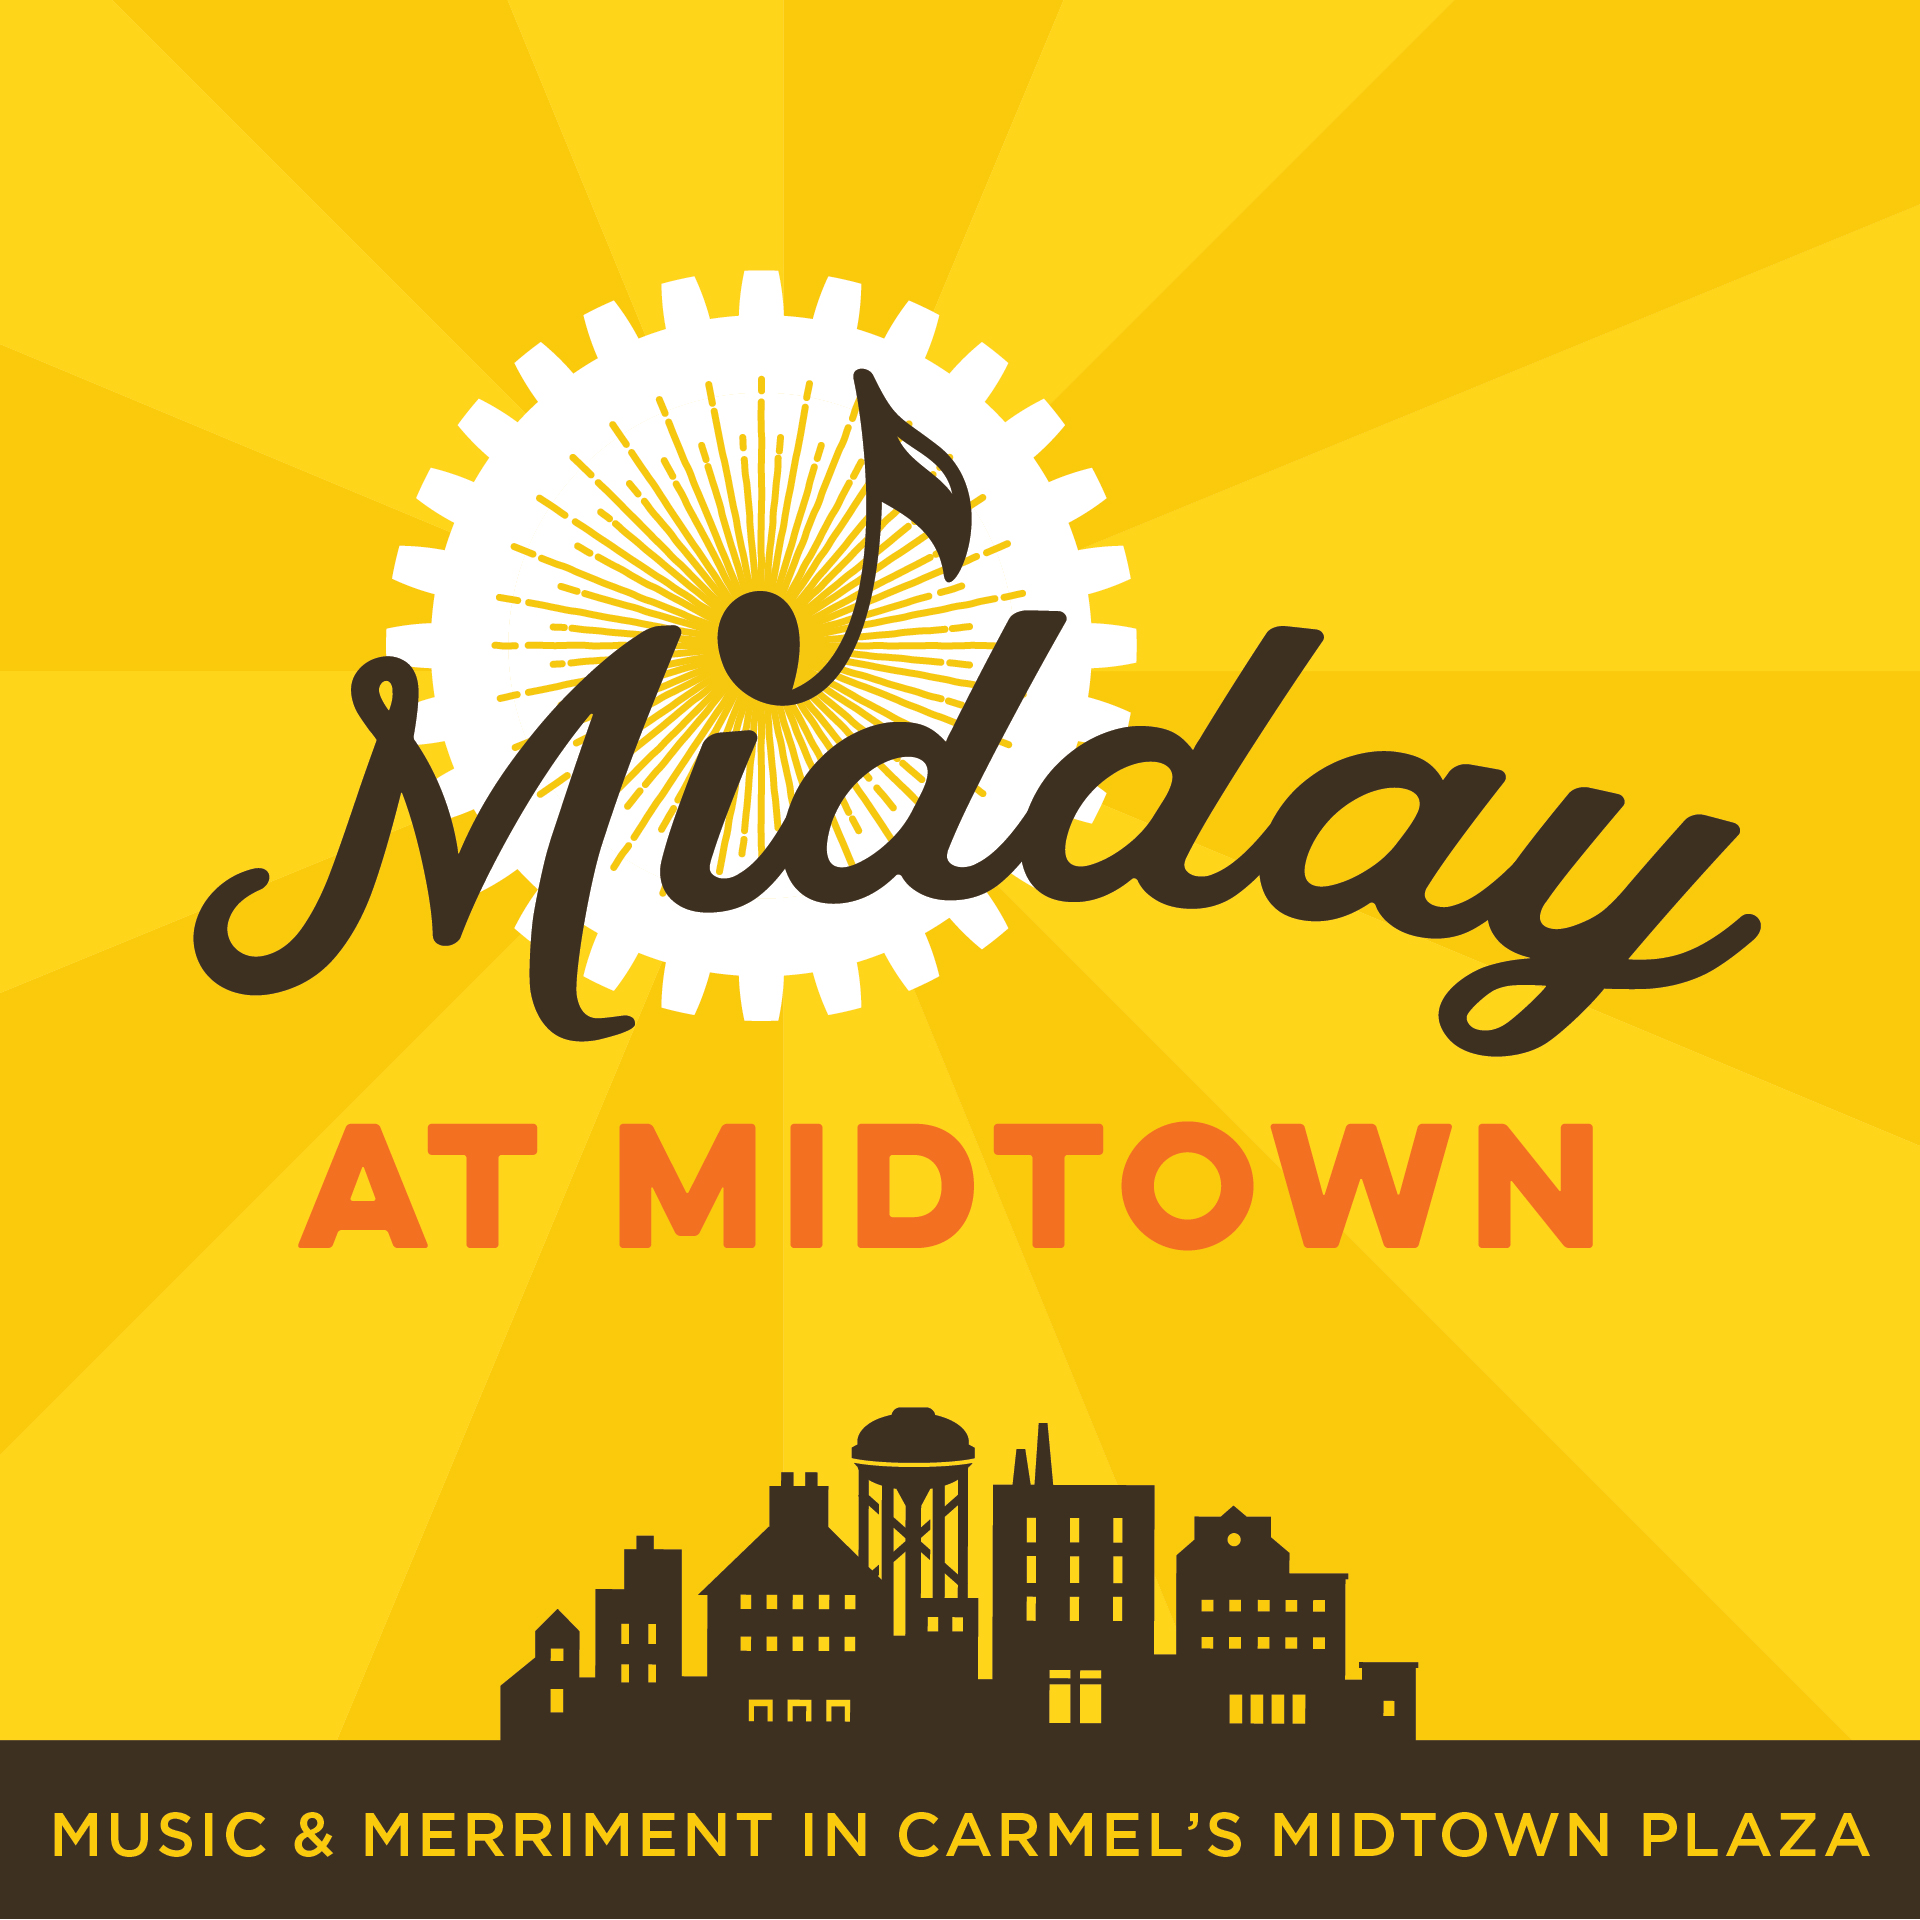 Midday at Midtown